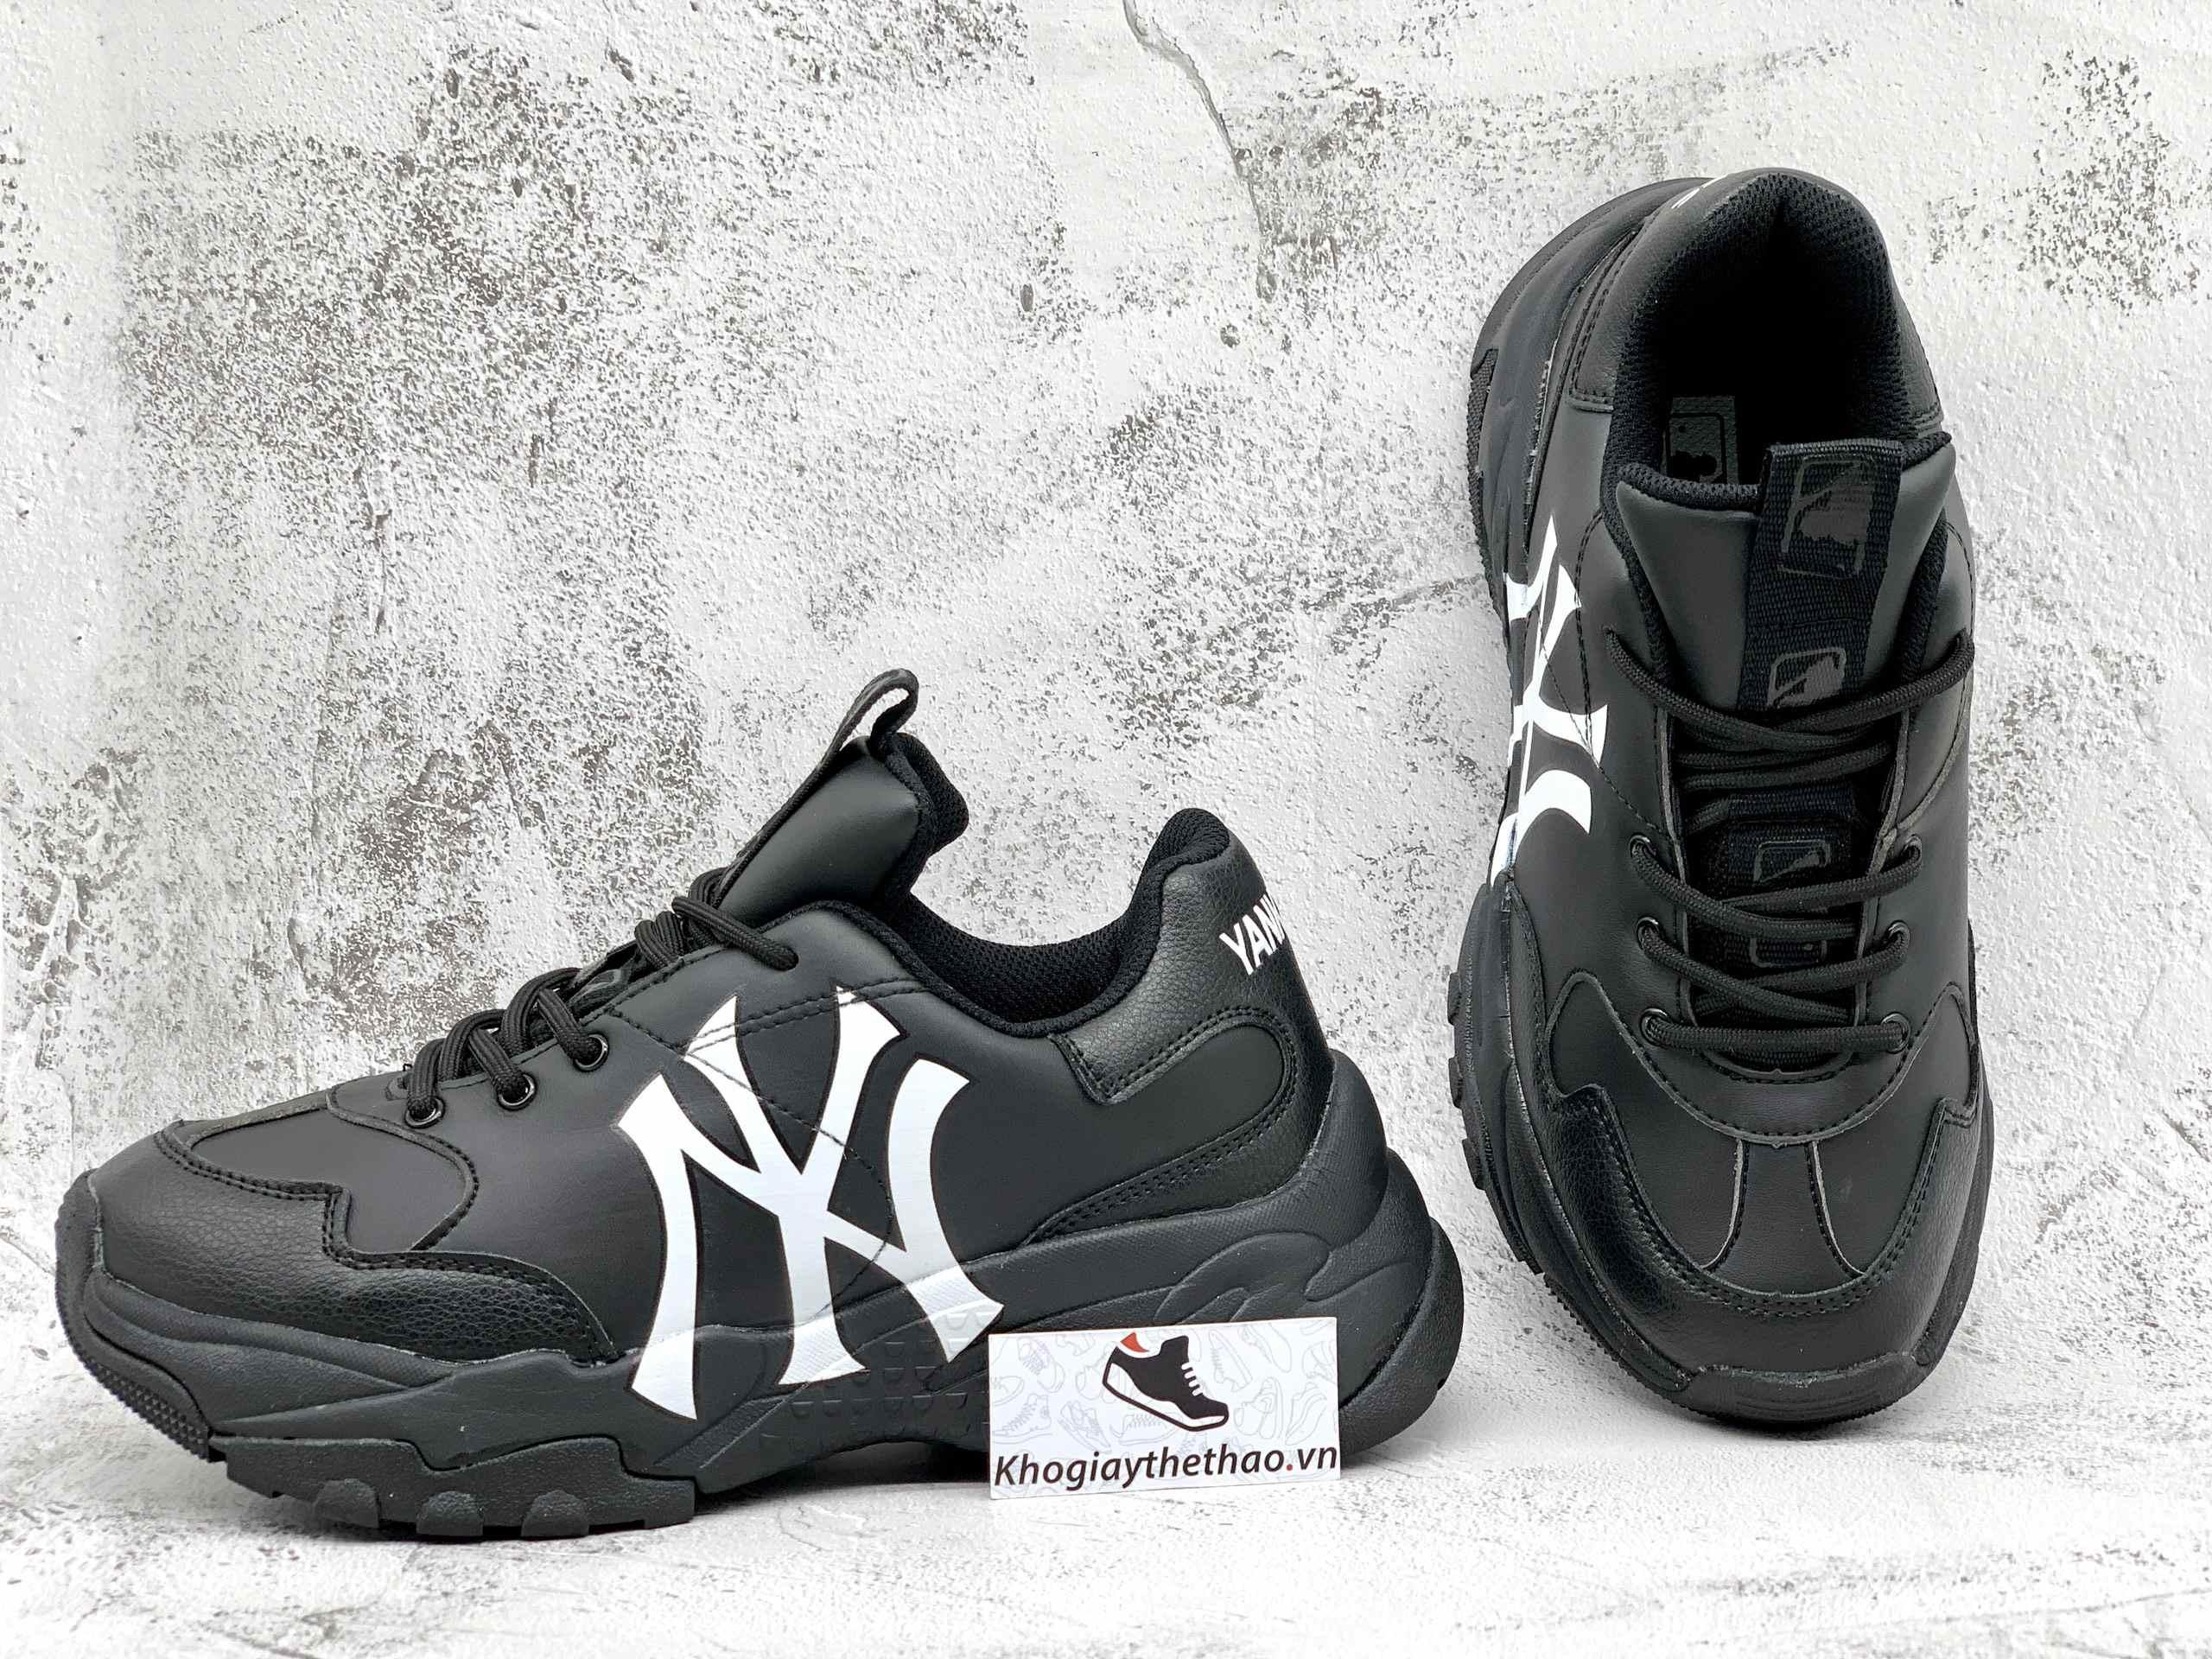 giày mlb ny chunky đen